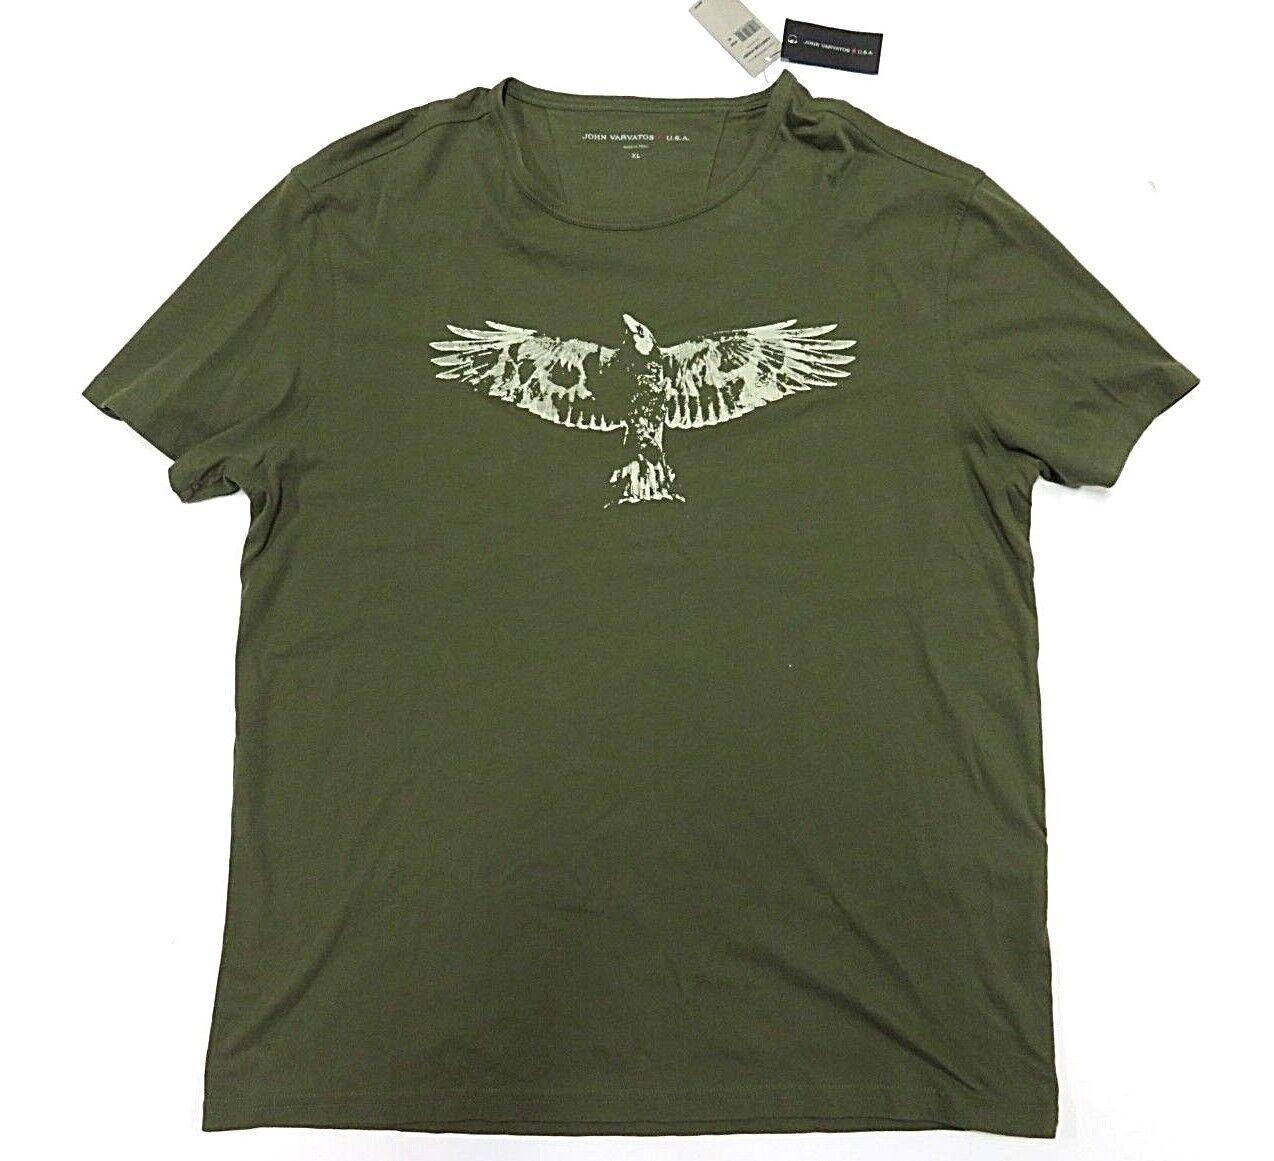 NWT John Varvatos Olive Short Sleeve Graphic Shirt Men's Size XL 100% Cotton